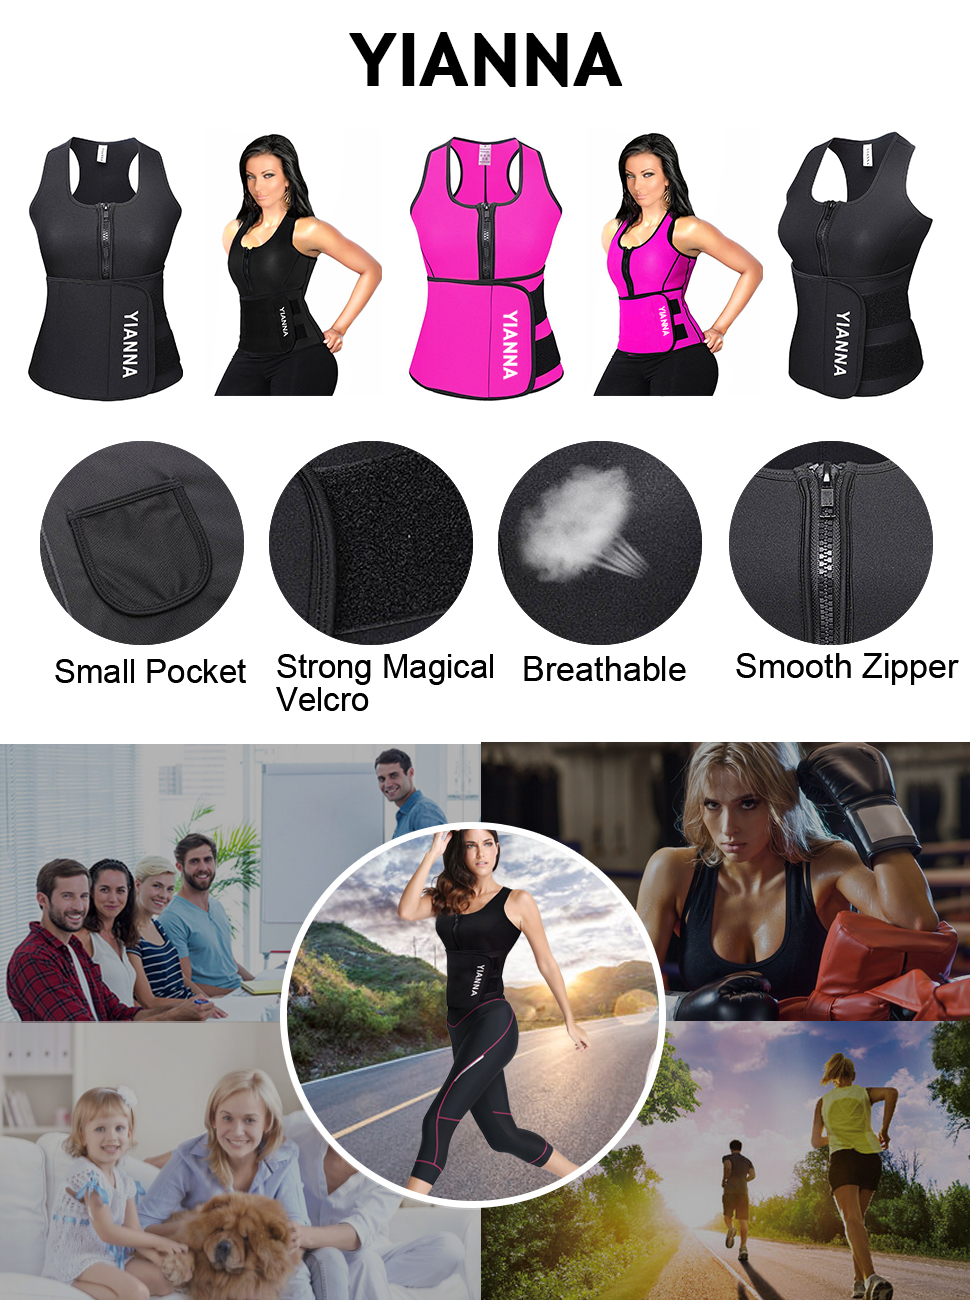 0427313f23d YIANNA Women s Waist Trainer Trimmer Vest - Sauna Tank Top Vest with  Adjustable Shaper Trainer Belt - High Quality Neoprene - Enhance Workout  During Cardio ...